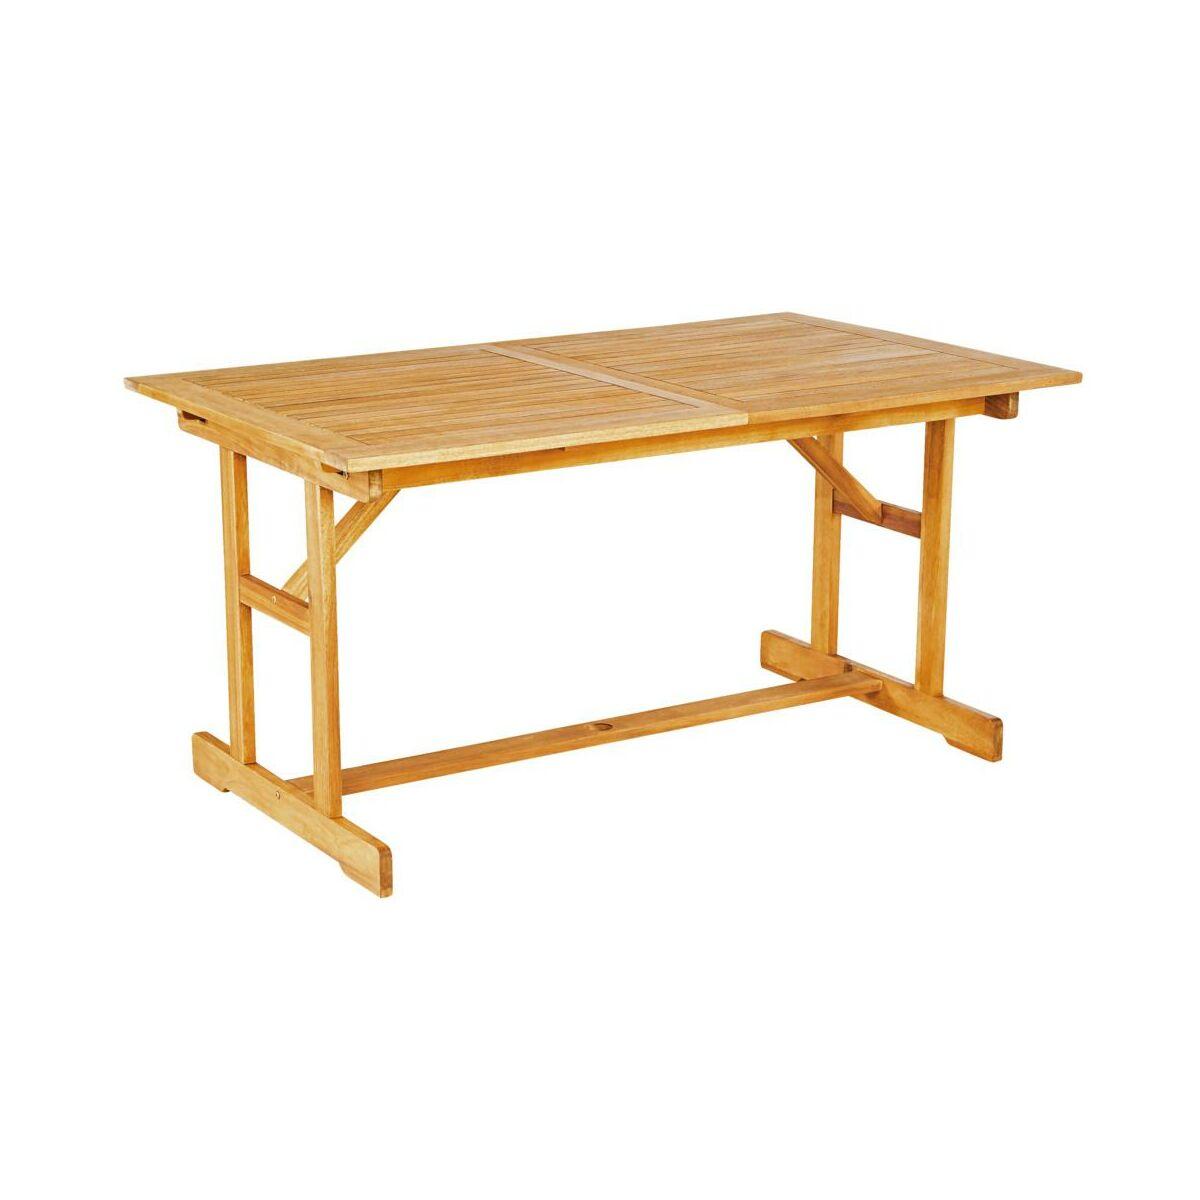 Stół ogrodowy 90 x 150-210 cm PORTO NATERIAL rozsuwany